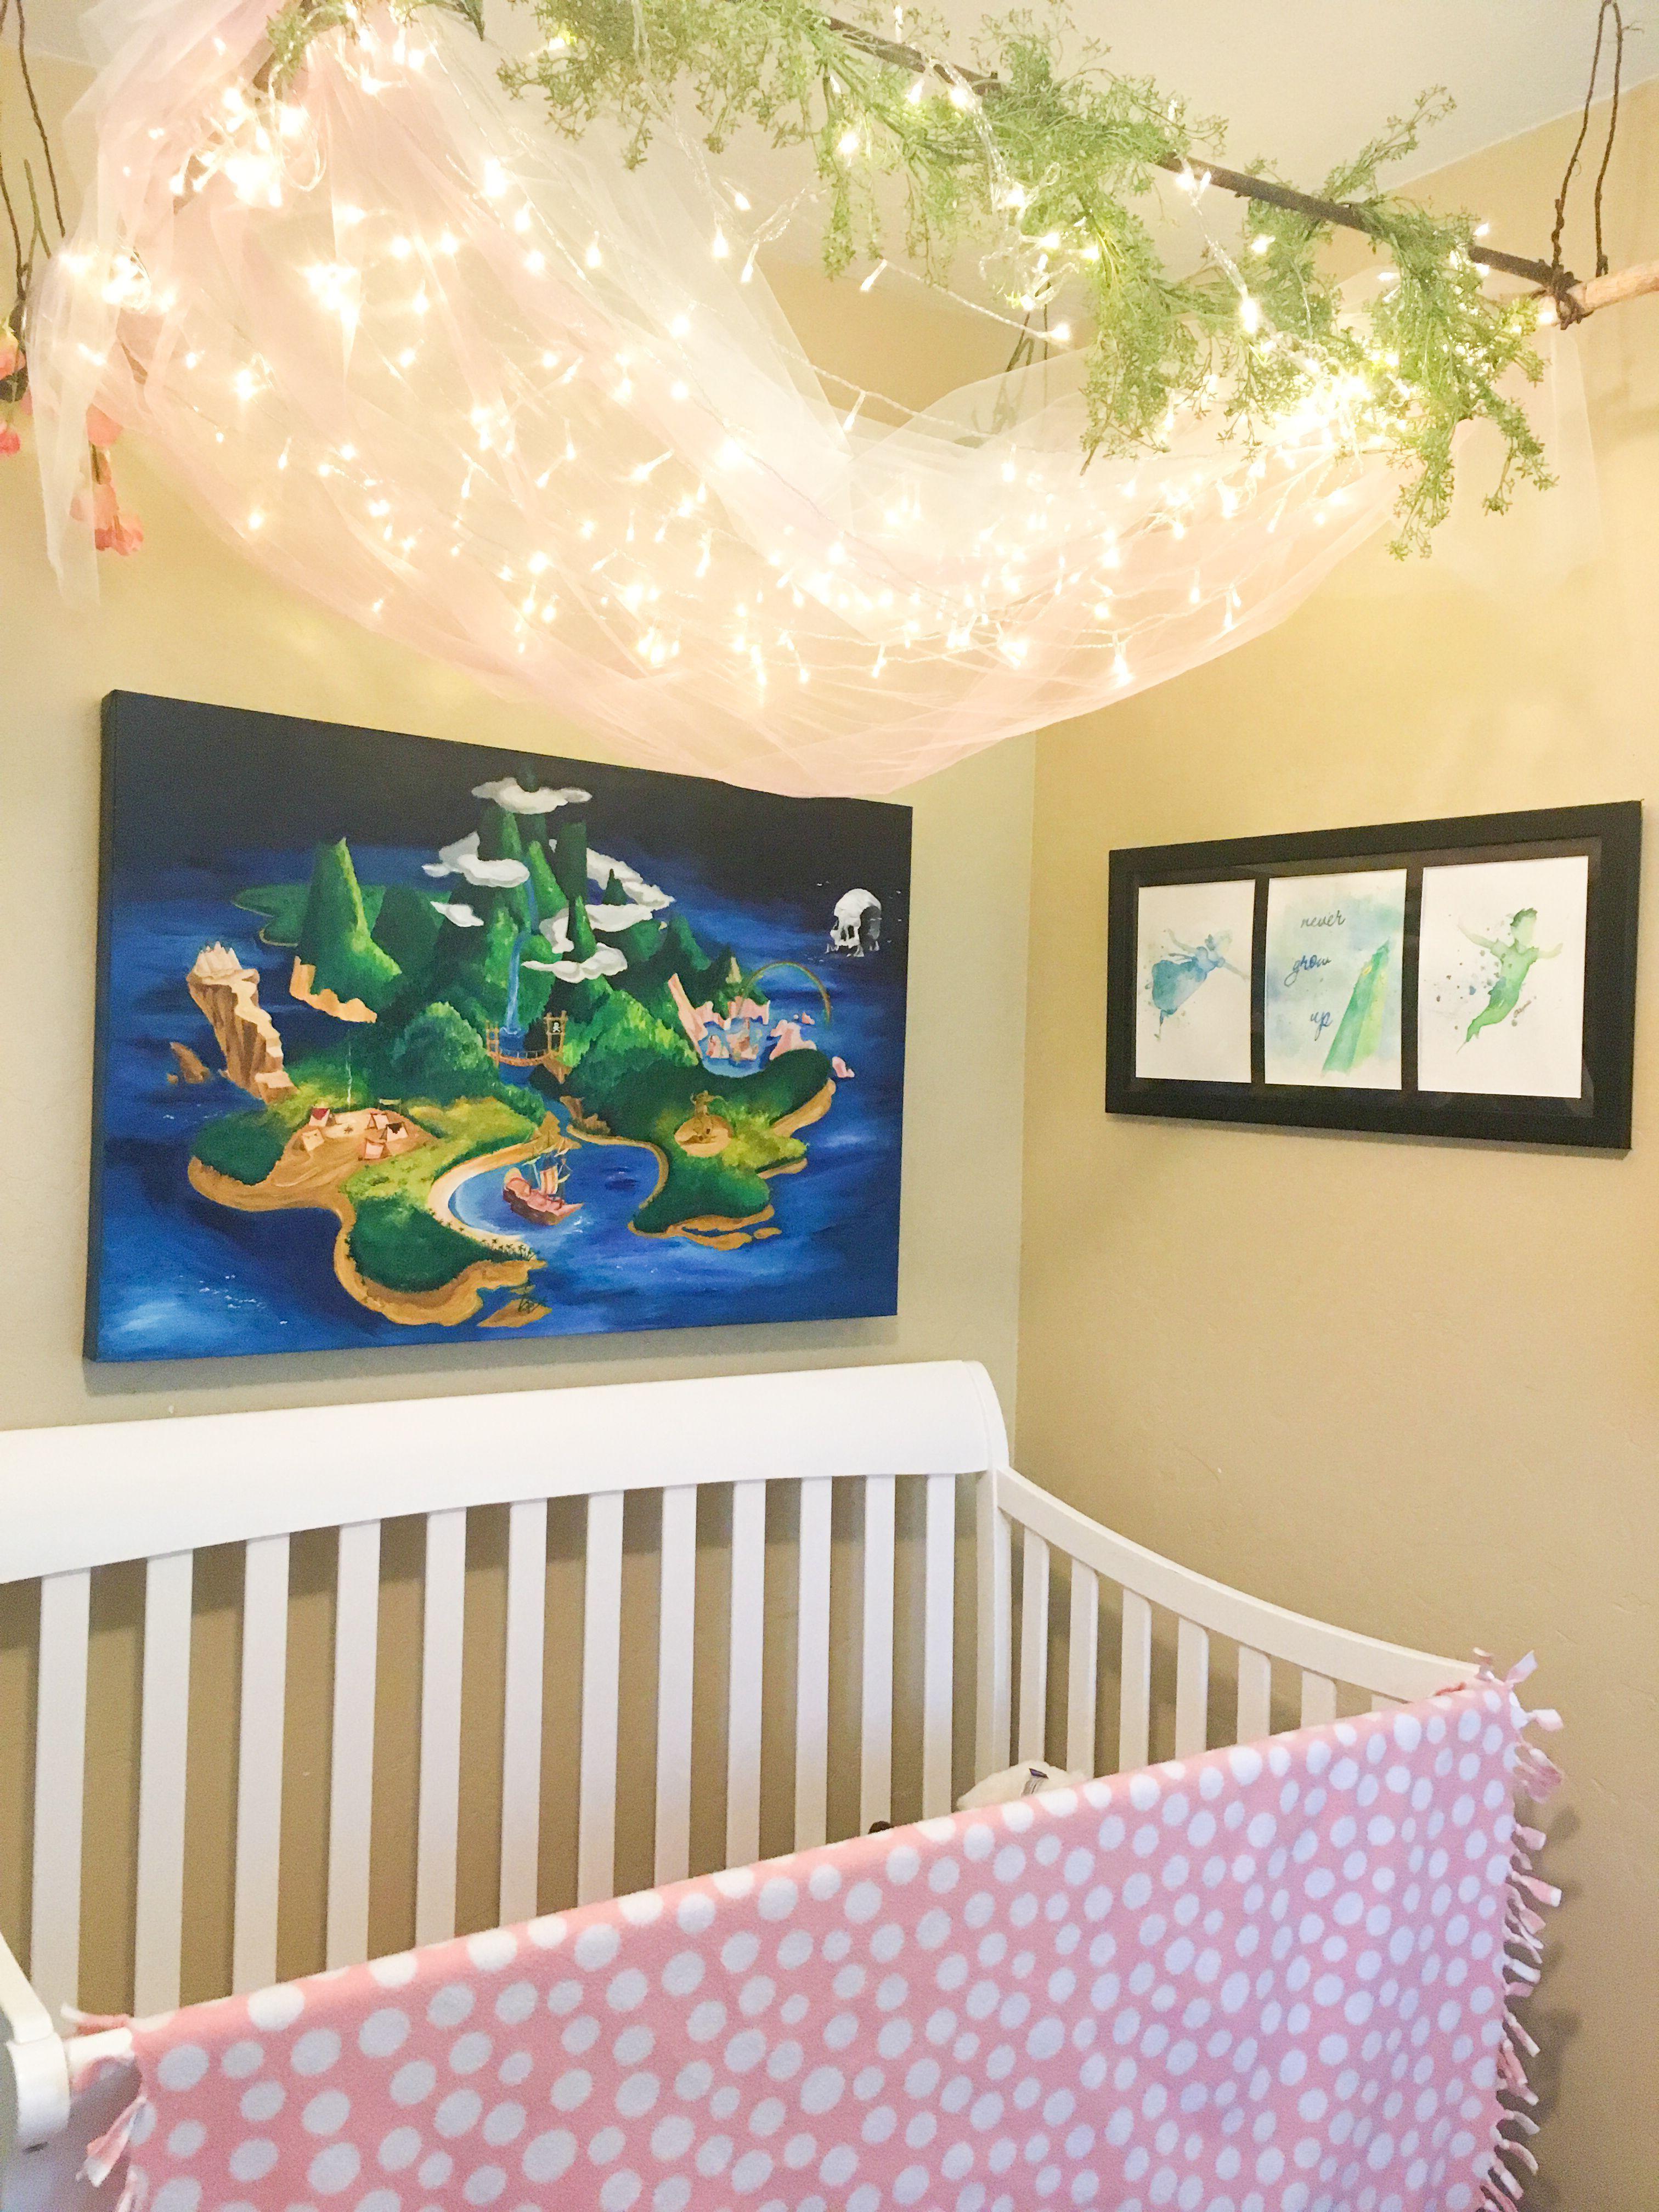 Peter Pan Nursery Nailed It